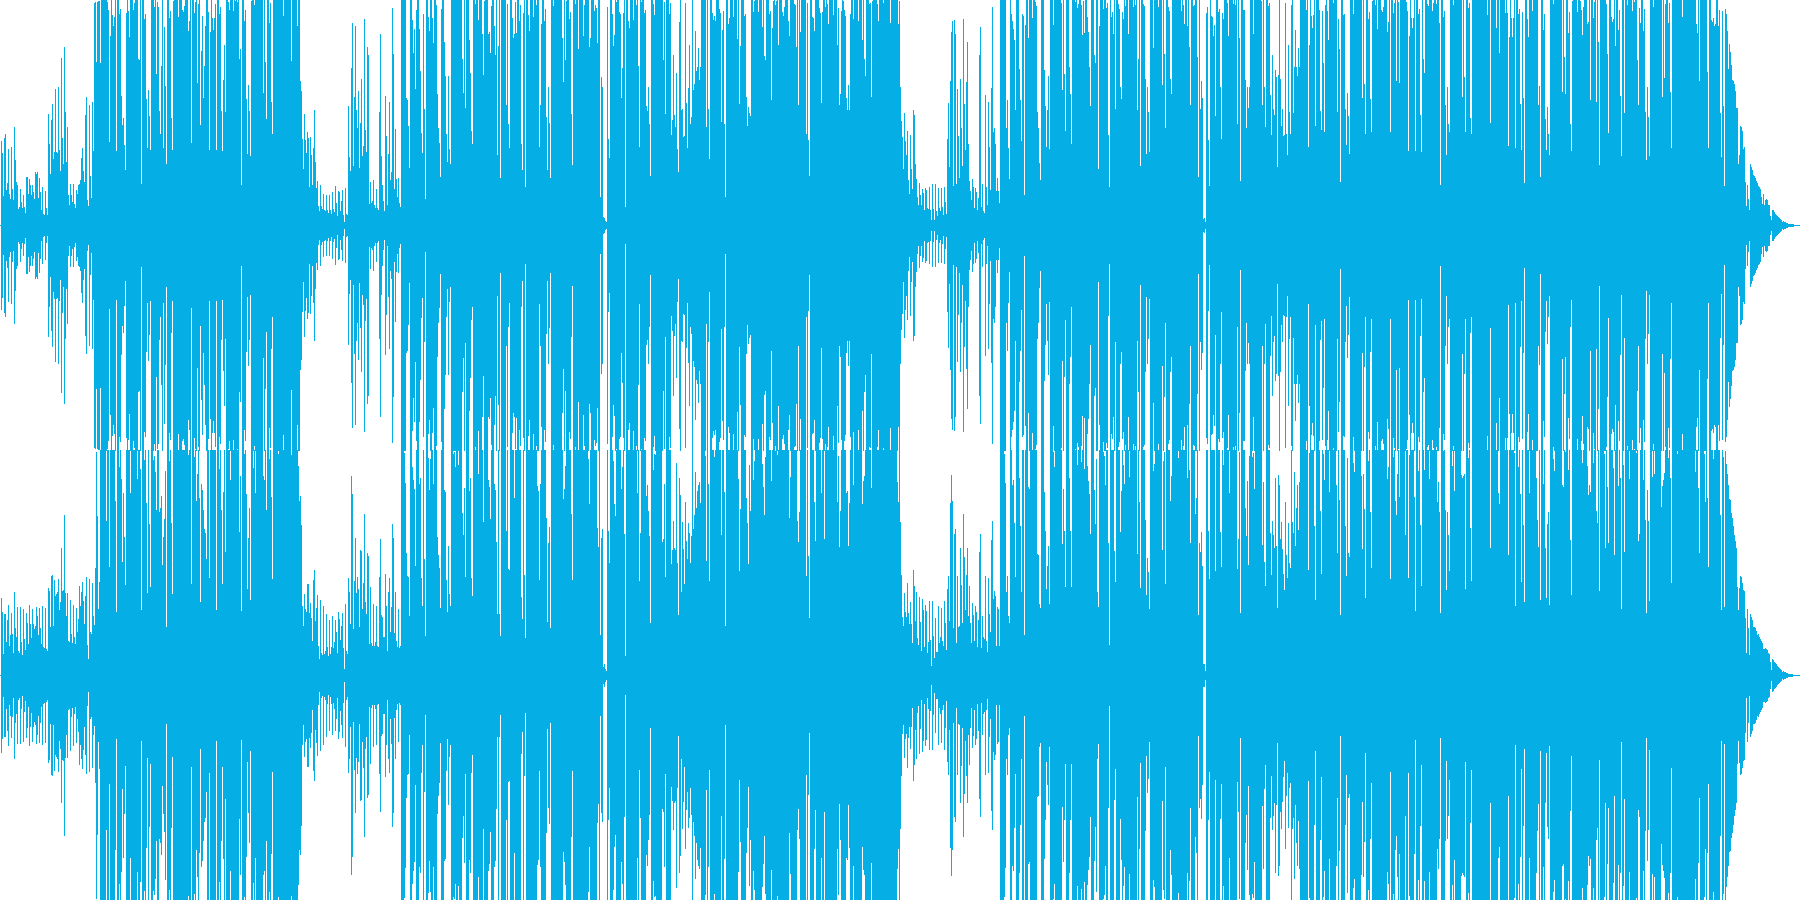 Trap 宇宙っぽいウワモノが印象的の再生済みの波形